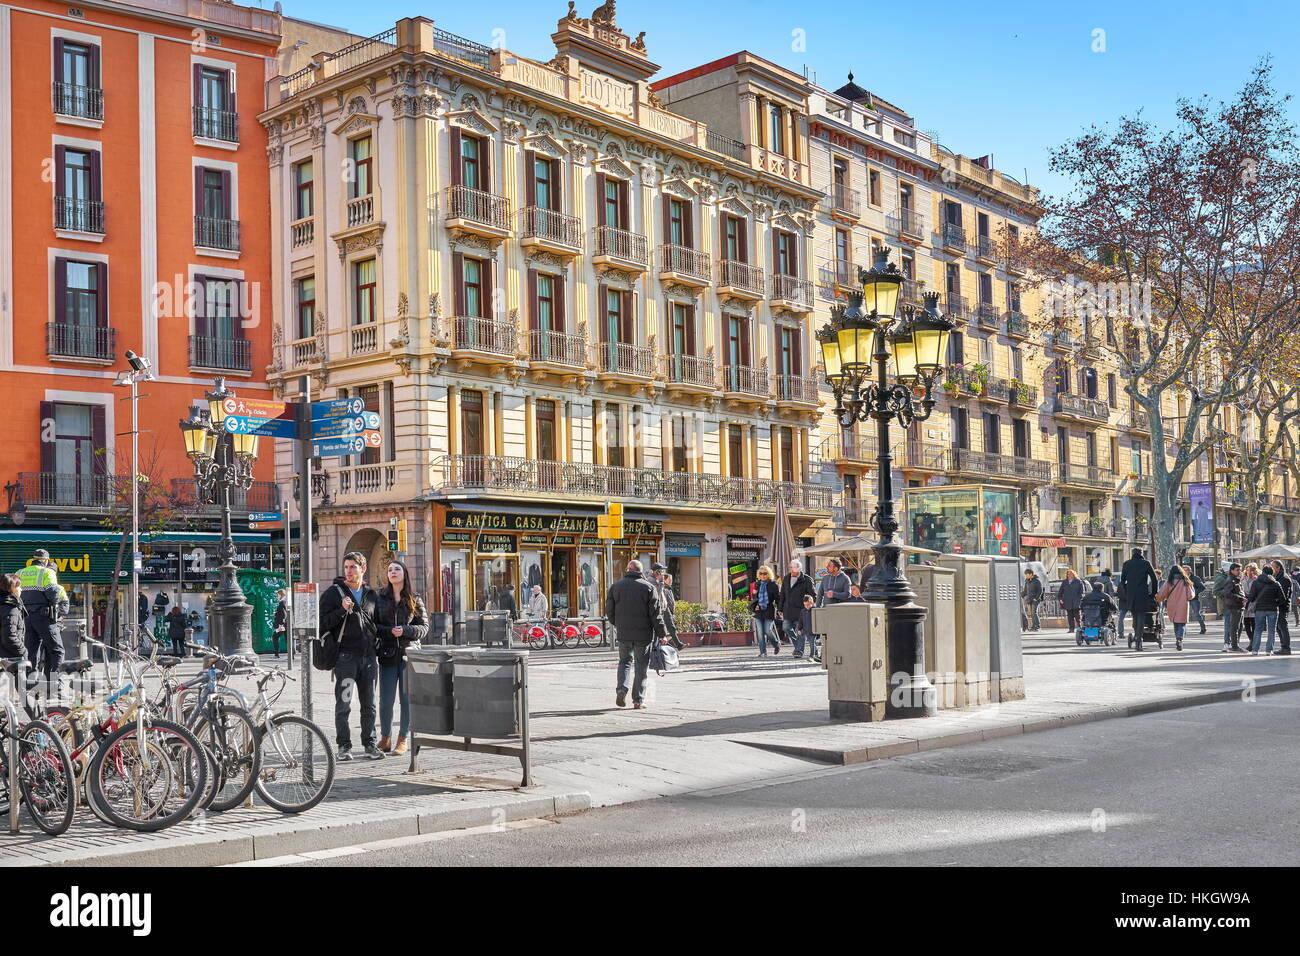 La Rambla, Calle Barcelona, Cataluña, España Imagen De Stock